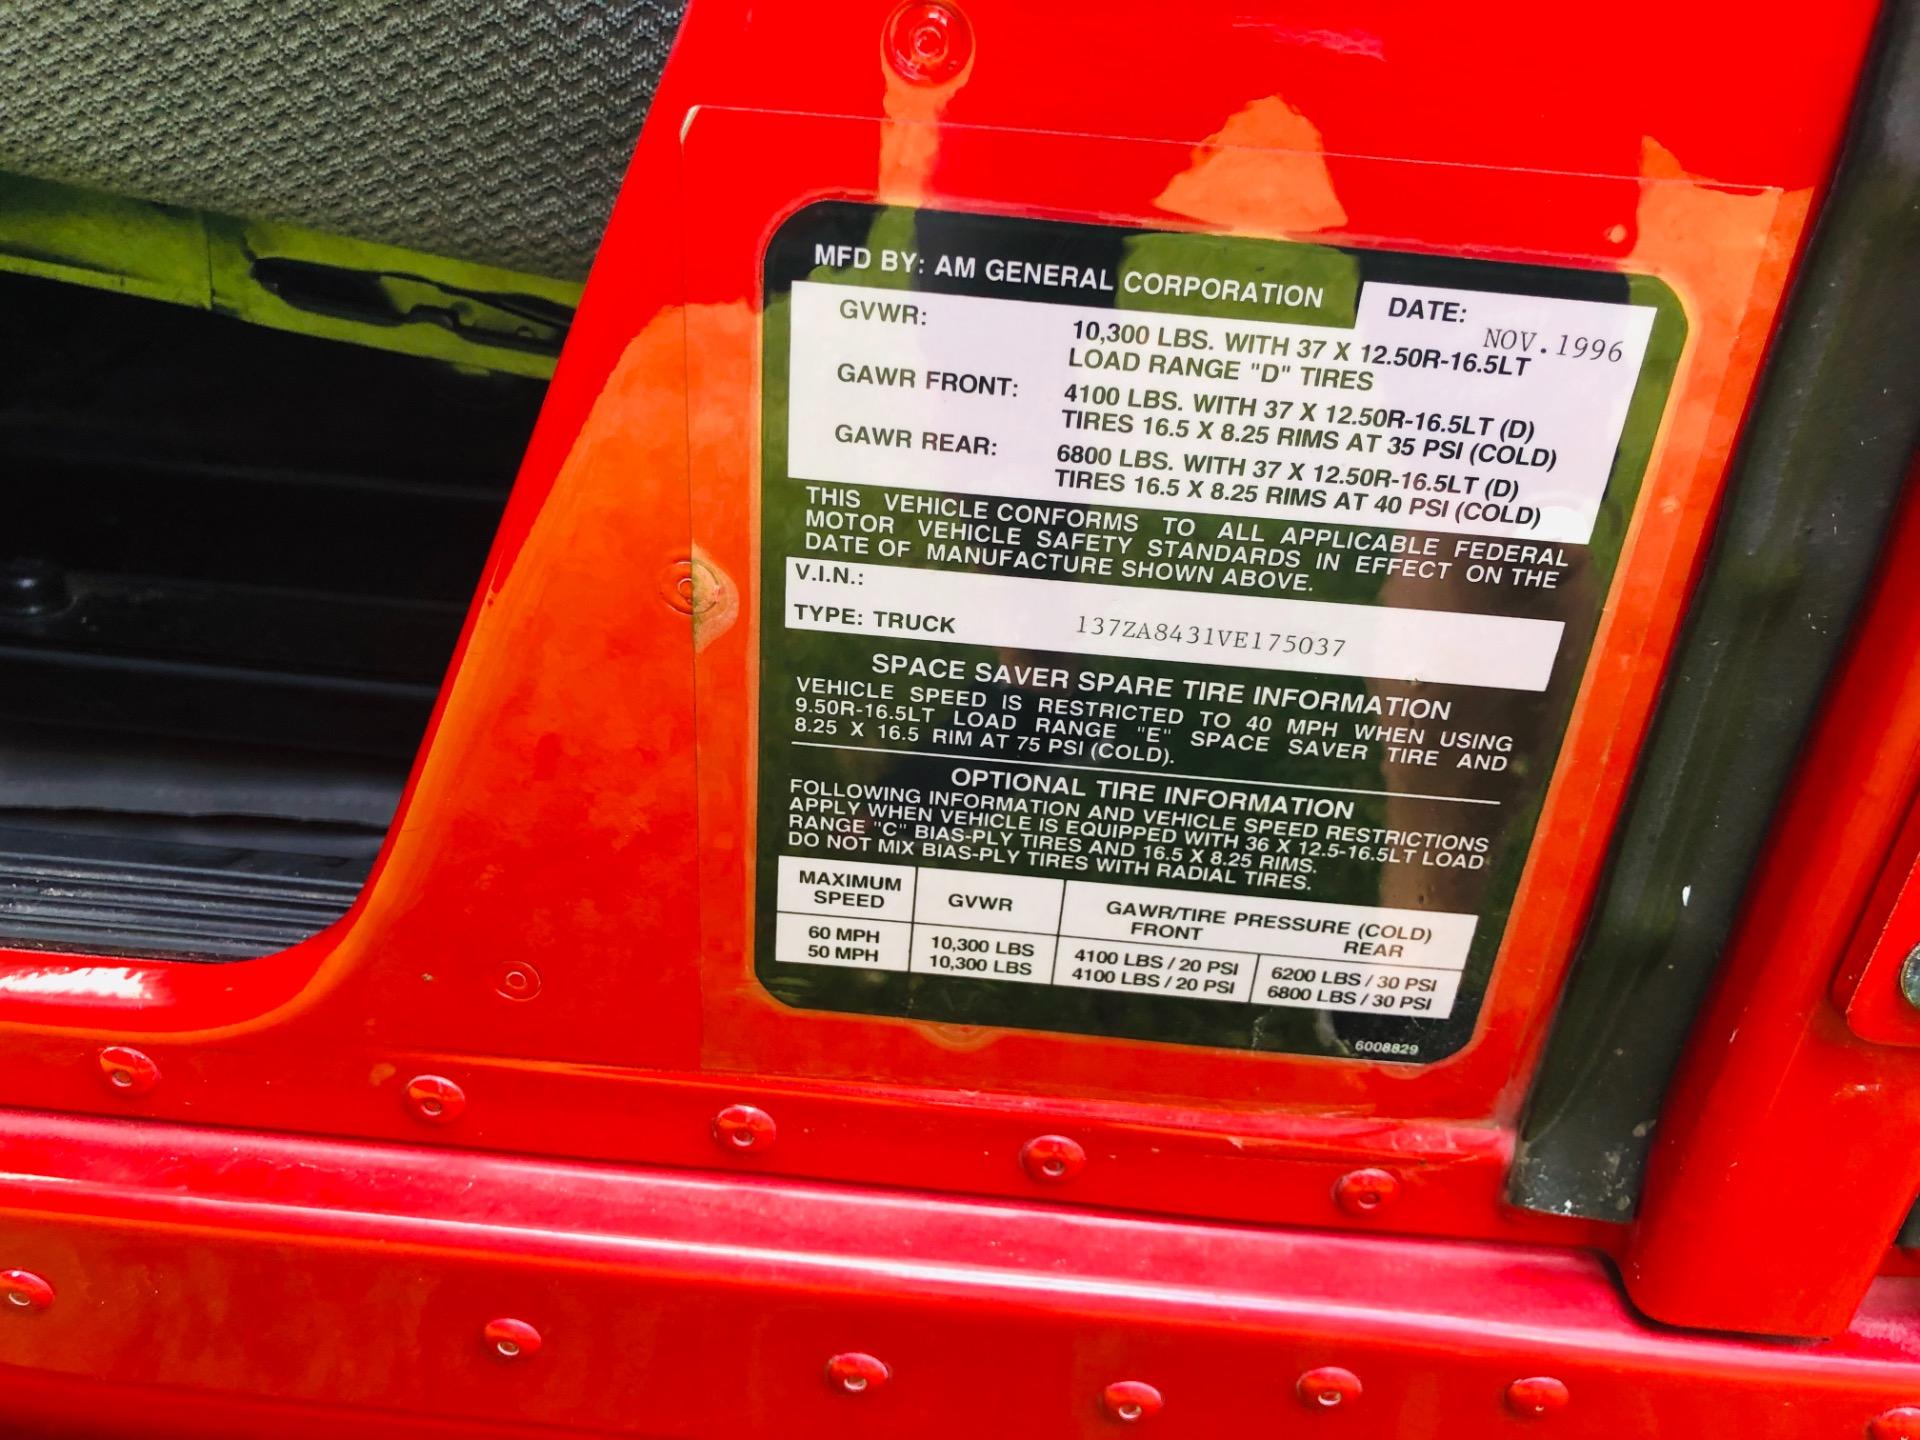 Used 1997 Hummer H1 -DUAL SKYLIGHTS-80k MILES TWIN TURBO DIESEL LUGGAGE RACK-VERY CLEAN- | Mundelein, IL